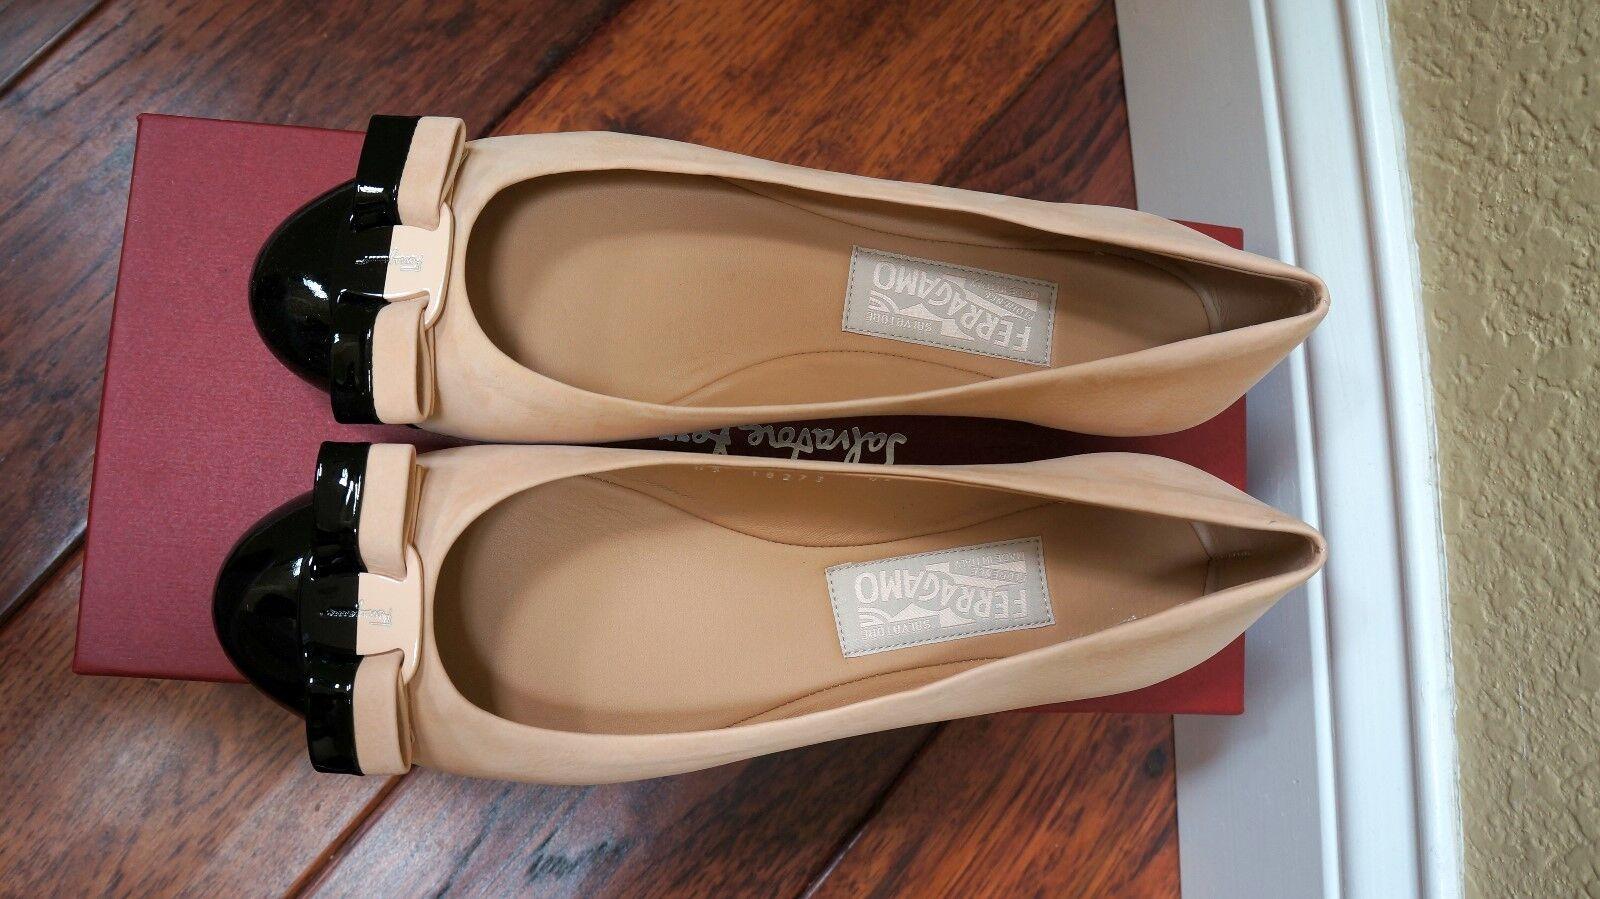 $600 NWT Cap Ferragamo Vara Cap NWT Toe Quarzo Rosa Suede Patent 7B 7.5B 8B GORGEOUS 2a1167